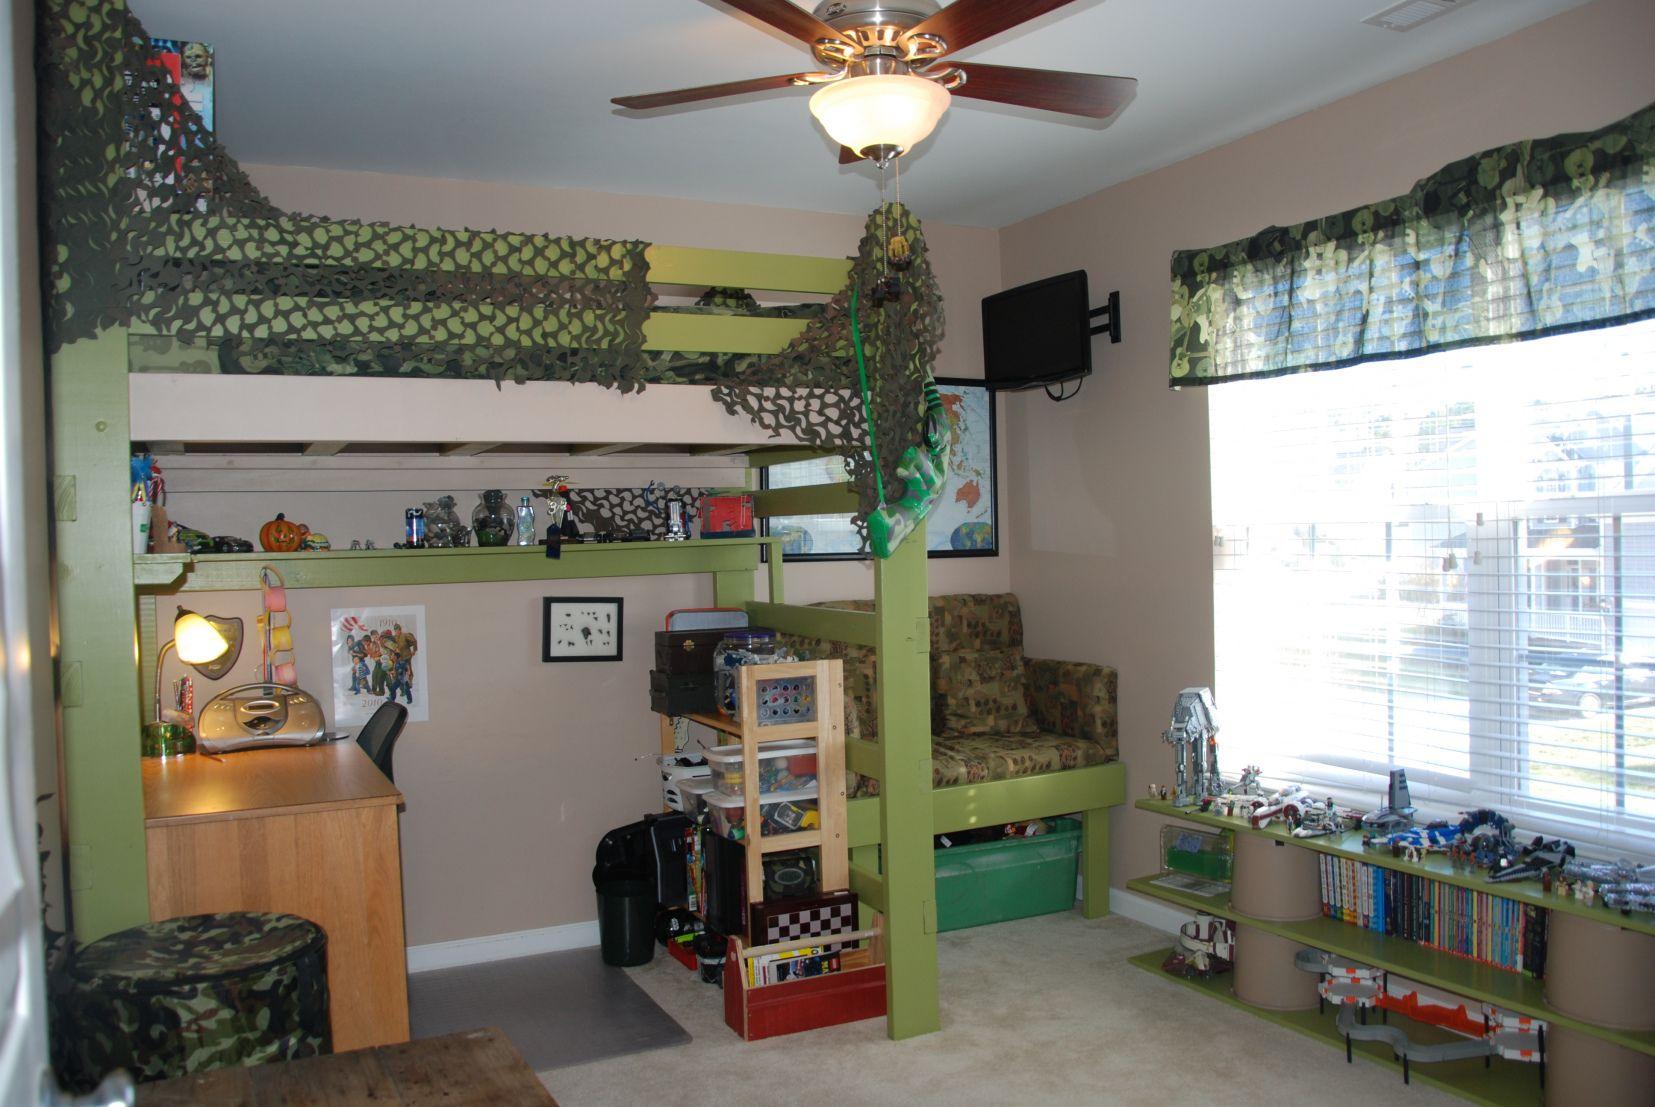 70 10 Year Old Boy Room Ideas Decoration Ideas For